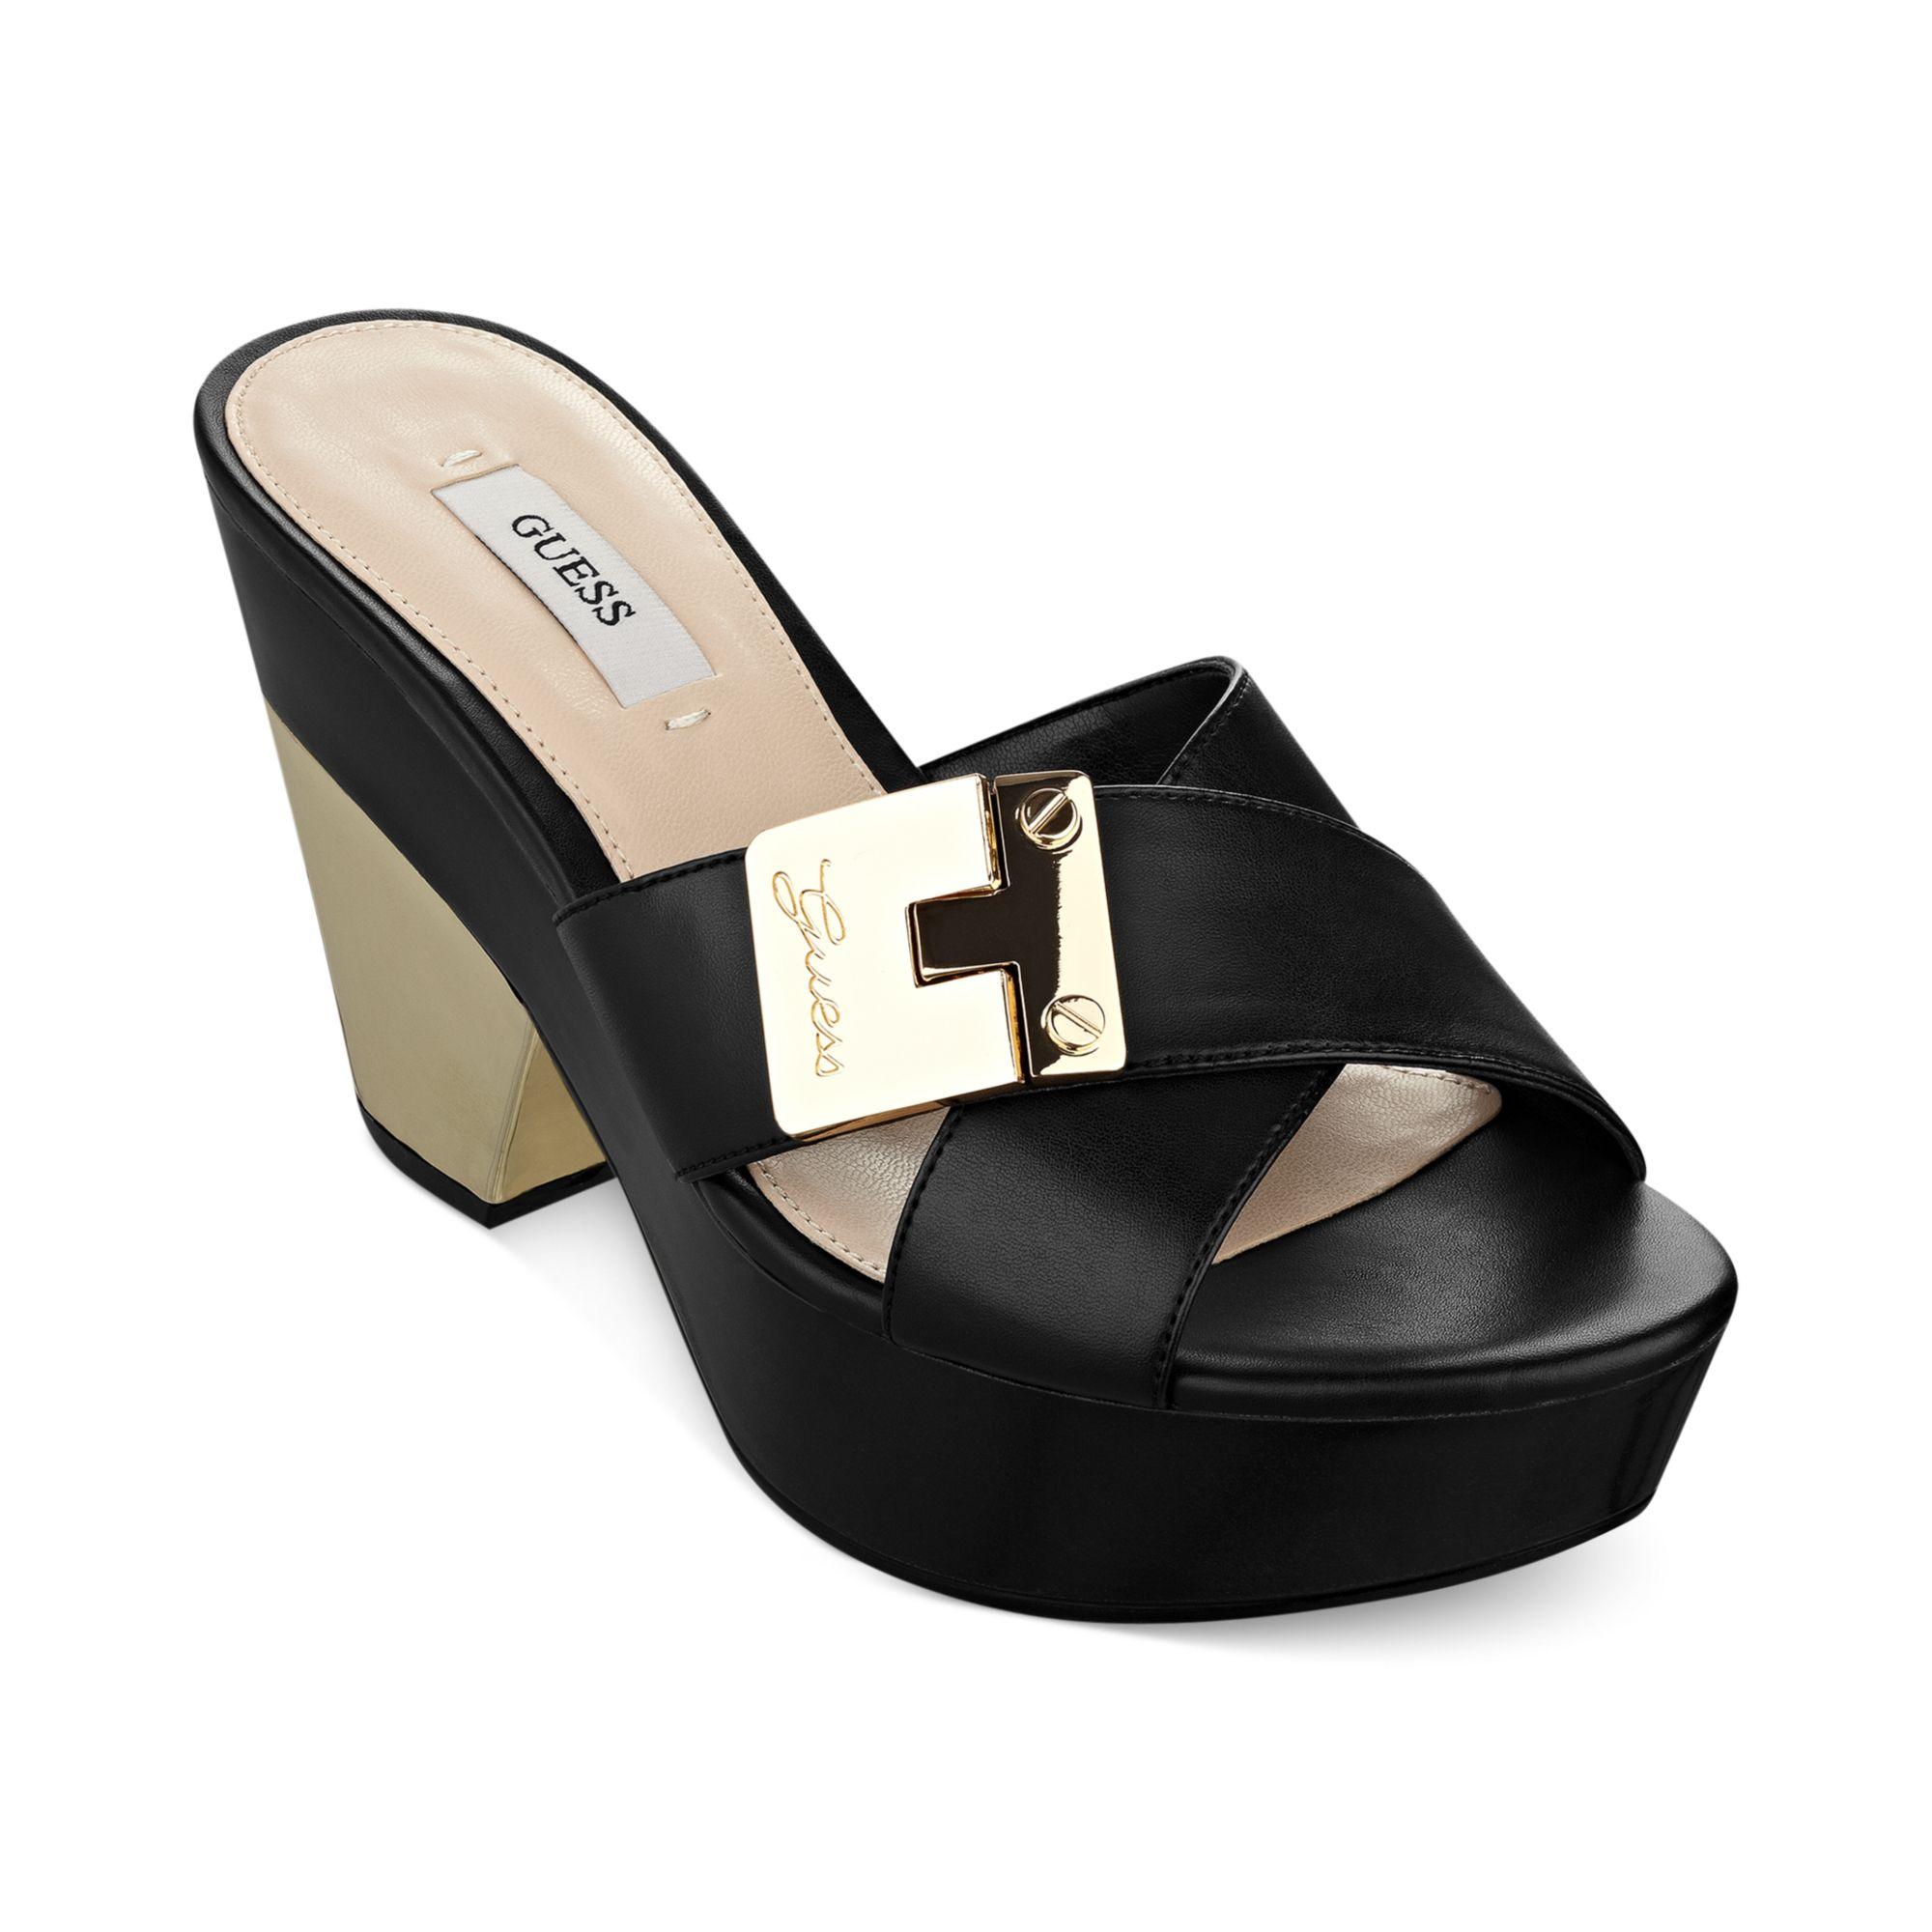 Guess Flat Shoes Black